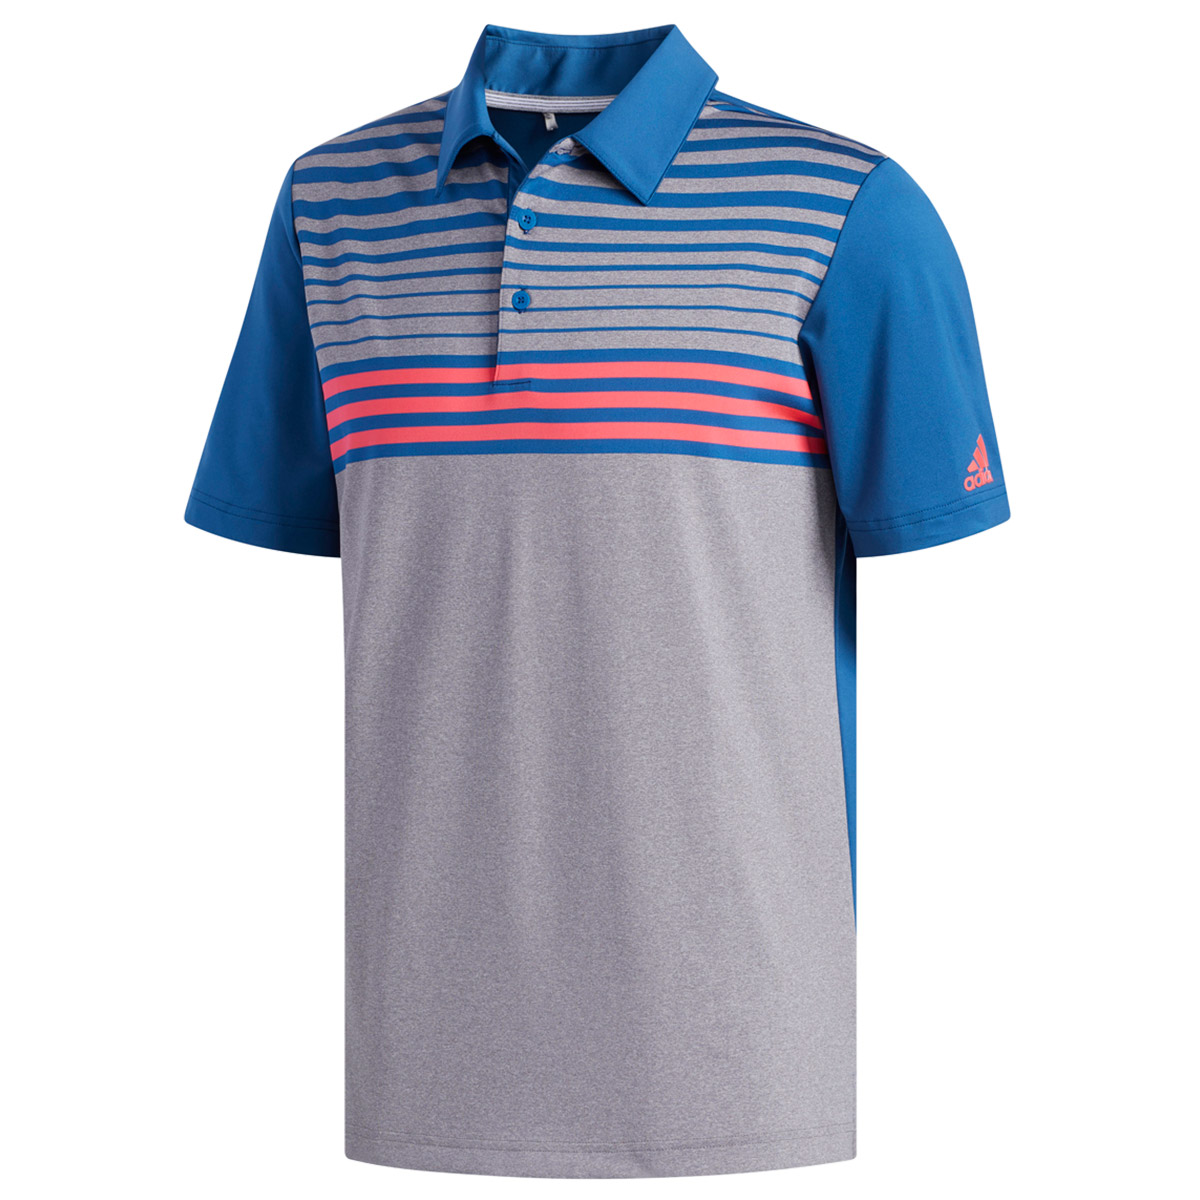 a86d6d3bfb adidas Golf Ultimate 365 3-Stripe Heather Polo Shirt